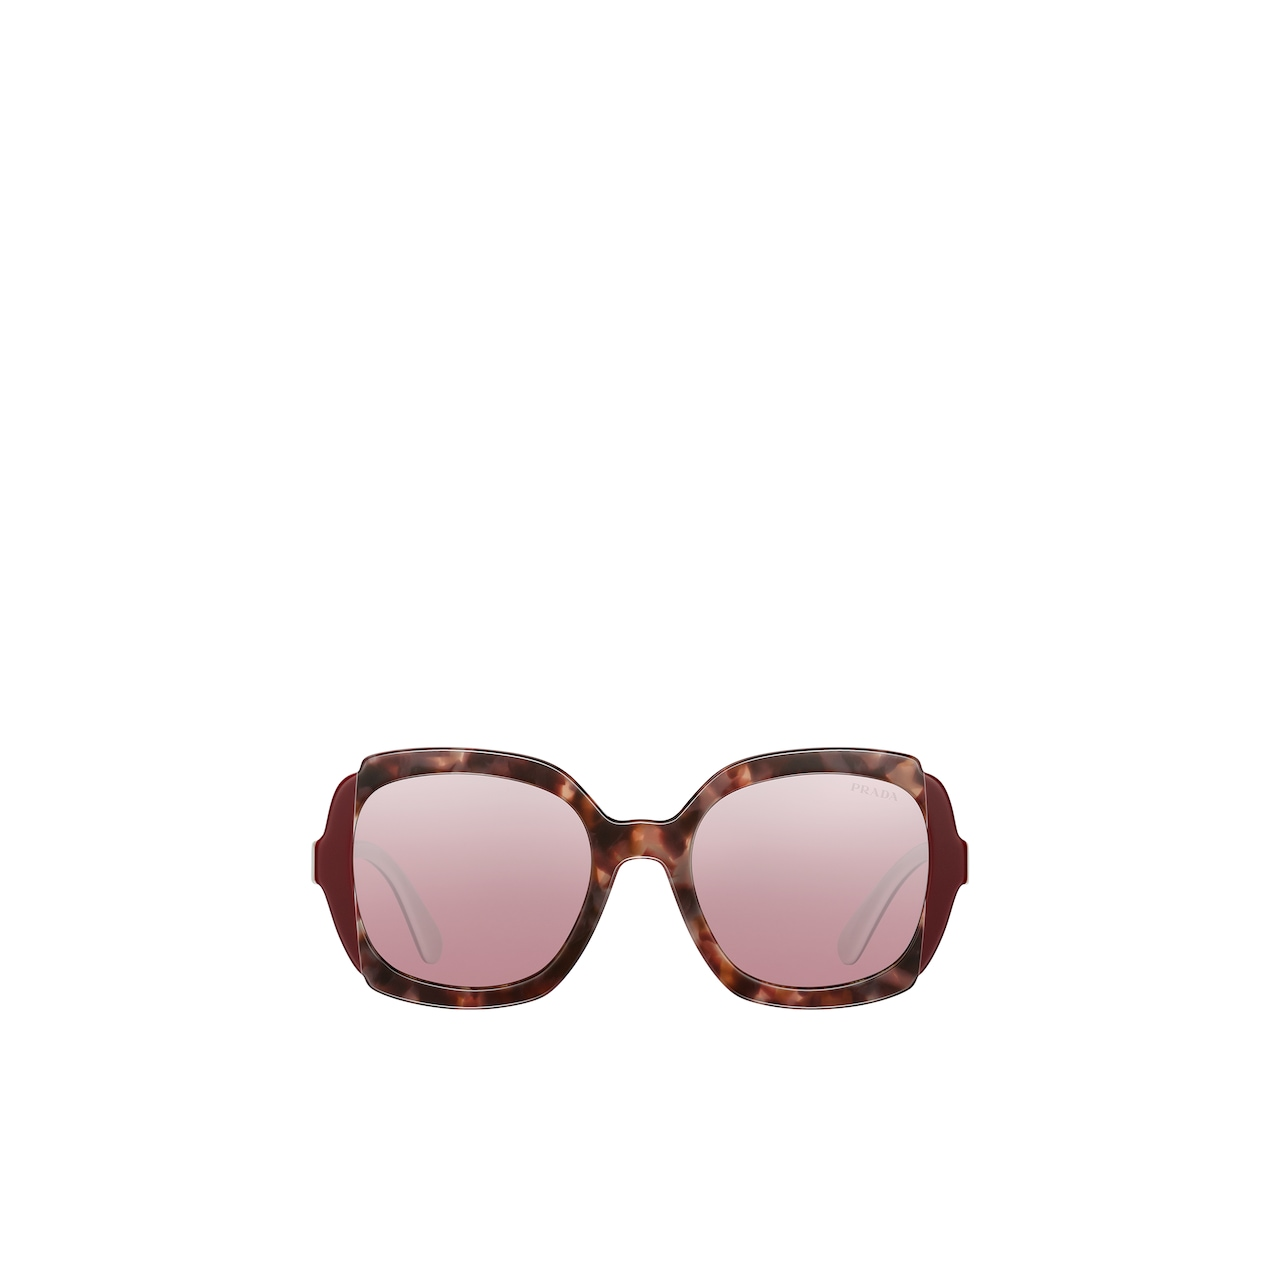 Collection de lunettes Prada